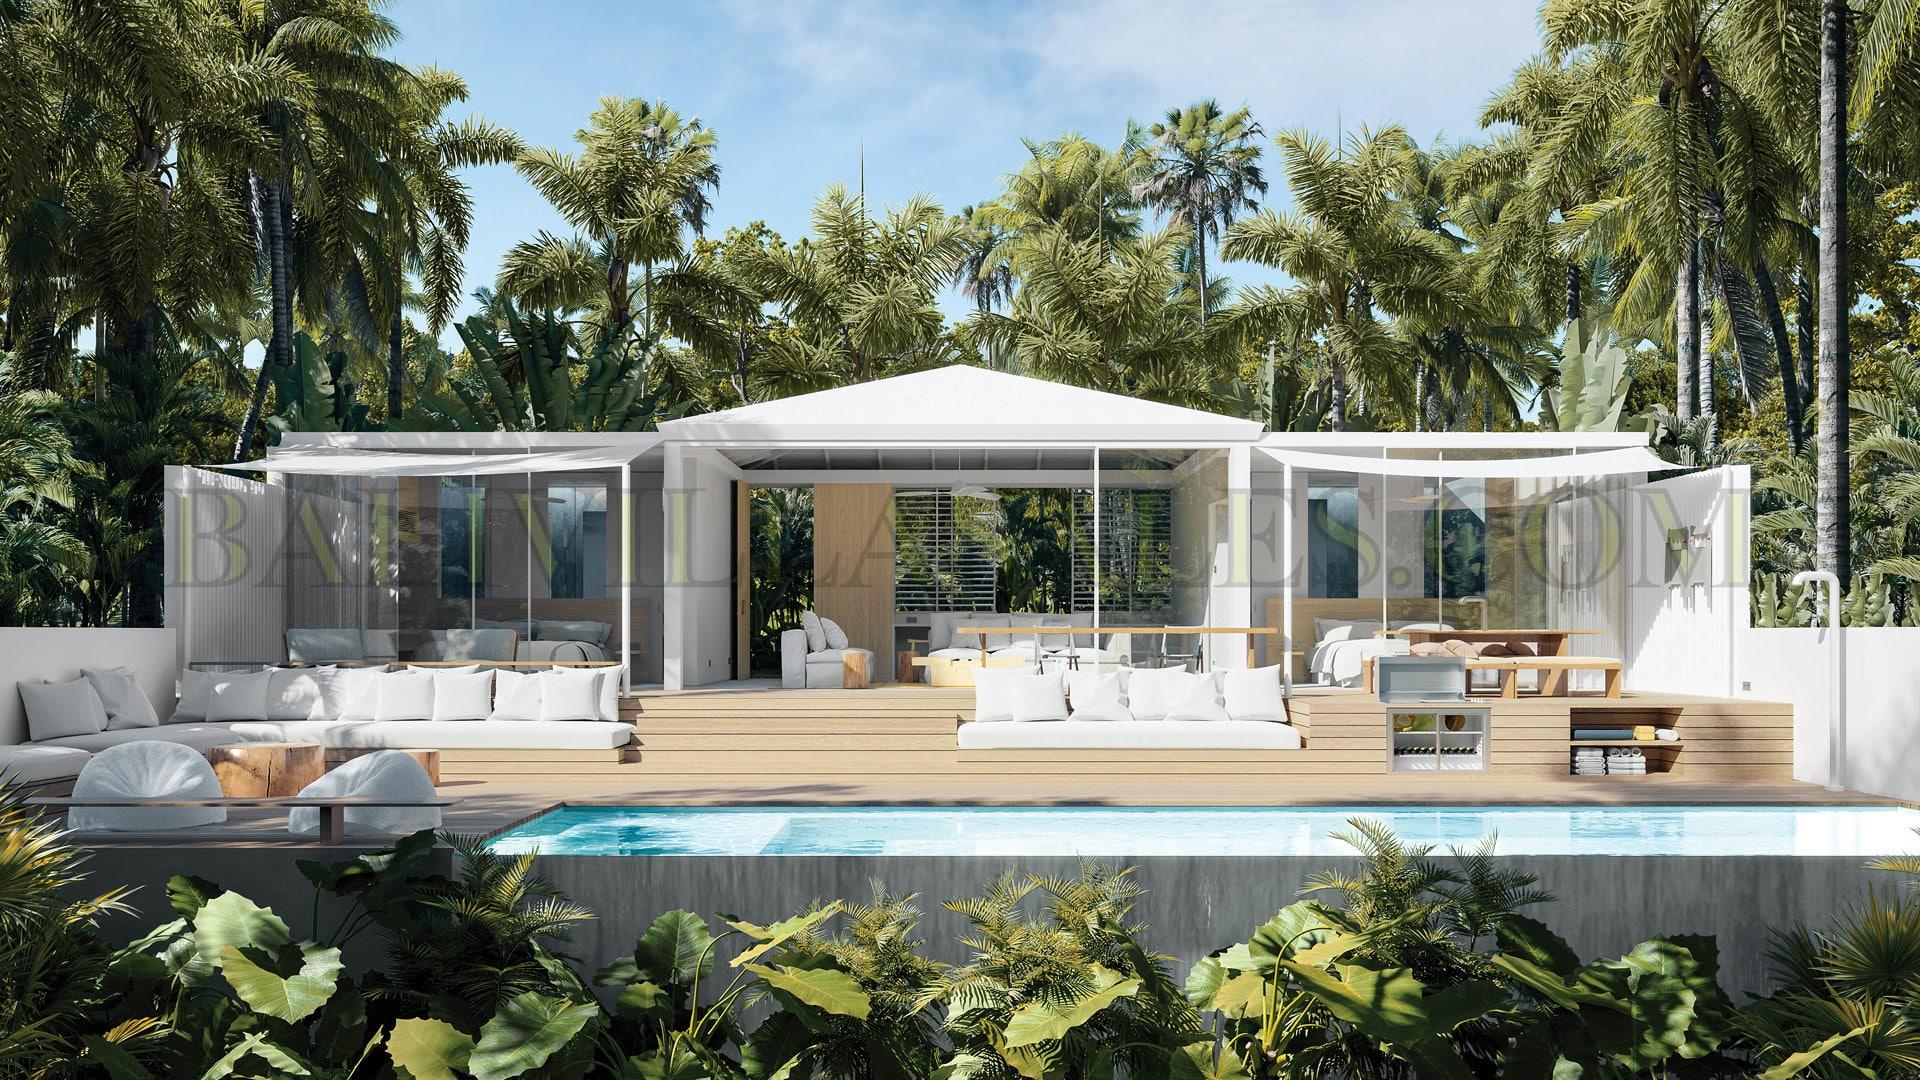 Sustainable luxurious 2-bedroom villa in Pererenan